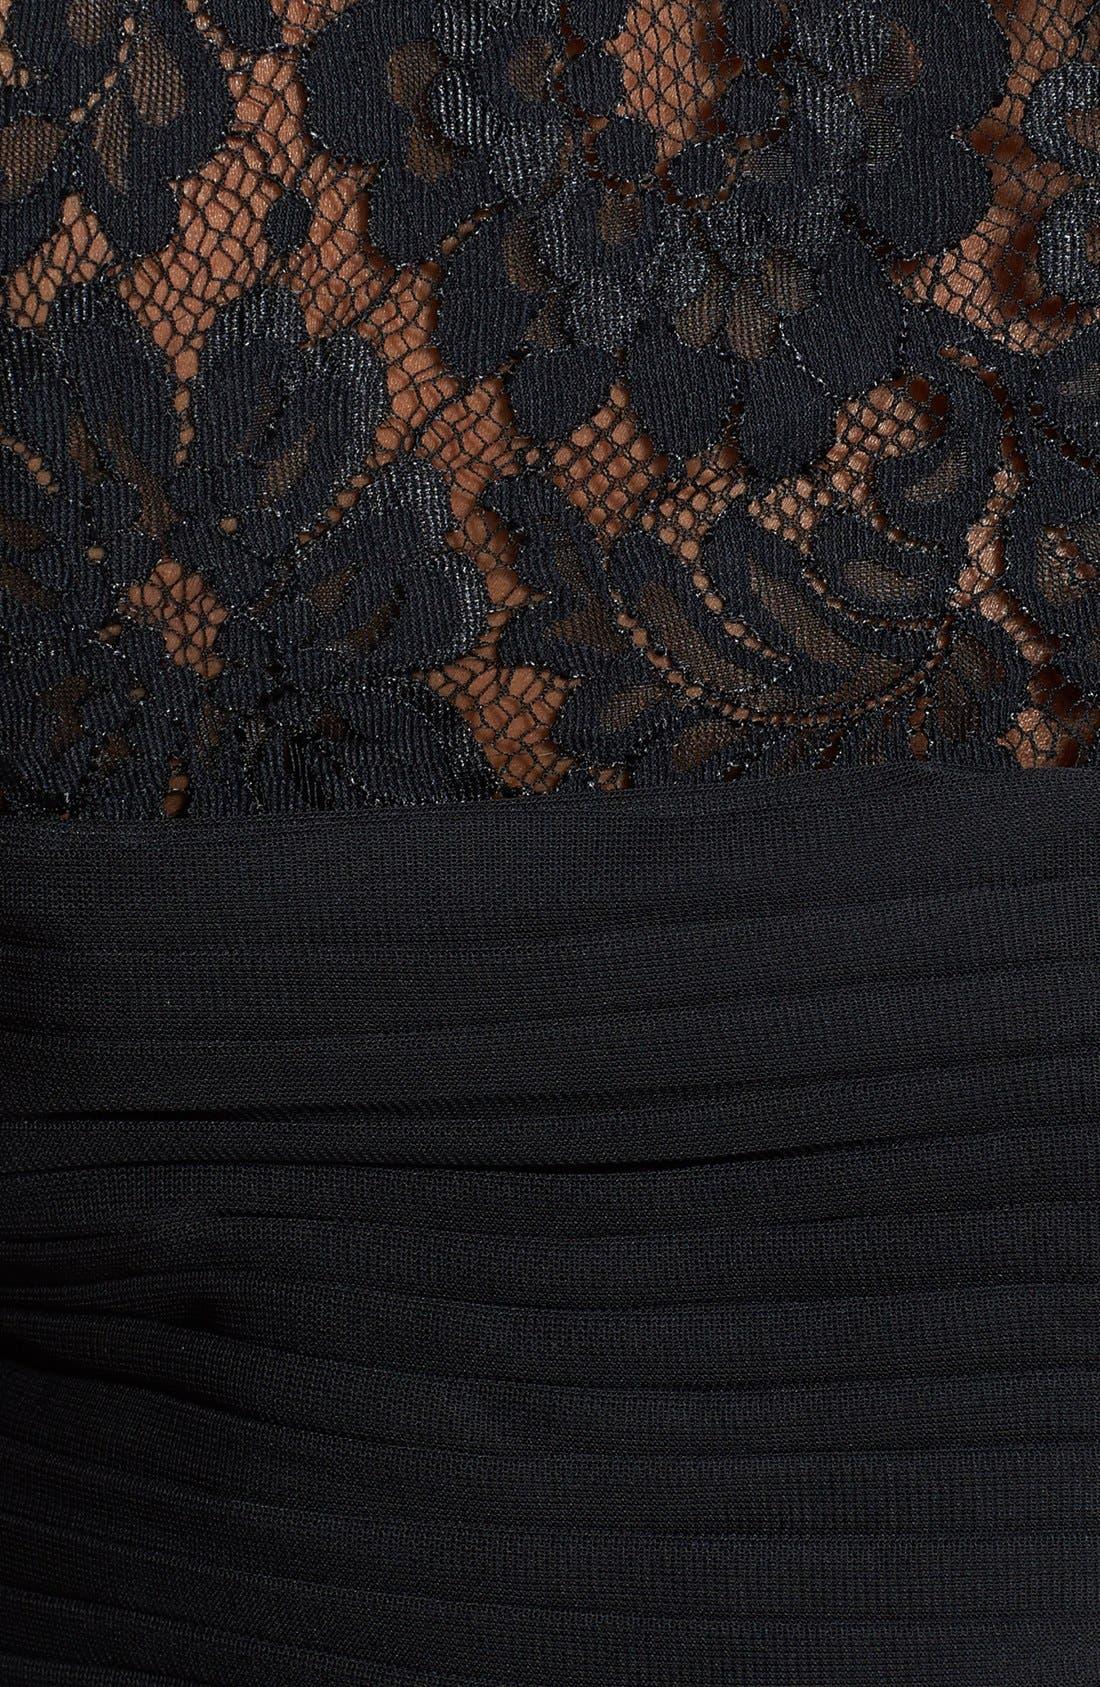 Alternate Image 3  - Xscape Embellished Chiffon & Knit Gown (Plus Size)